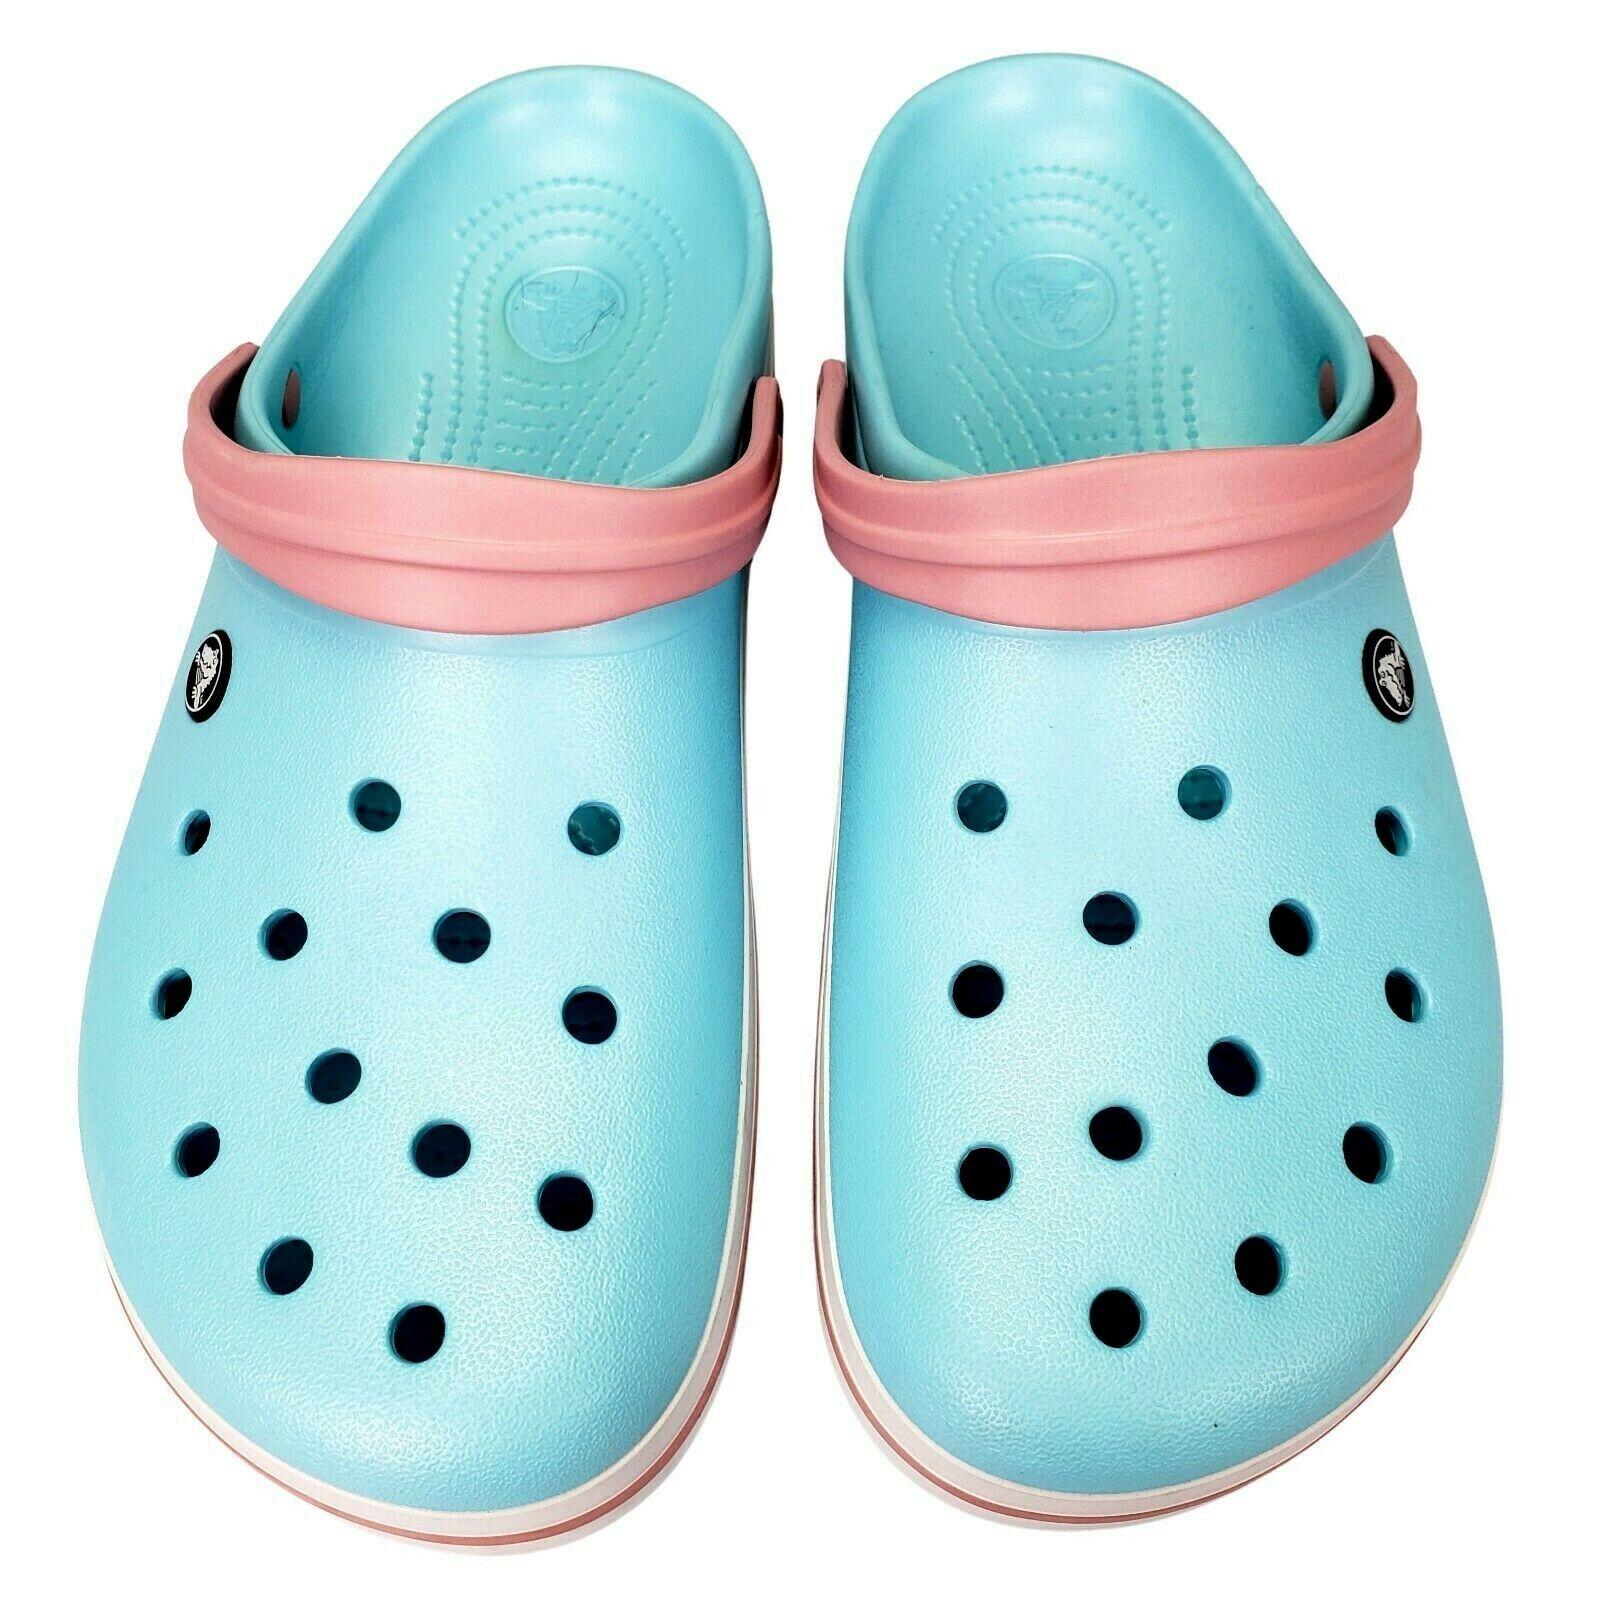 Crocs Clogs Mens Comfort Shoes Size 13 Crocband Light Ice Blue Pink White NICE